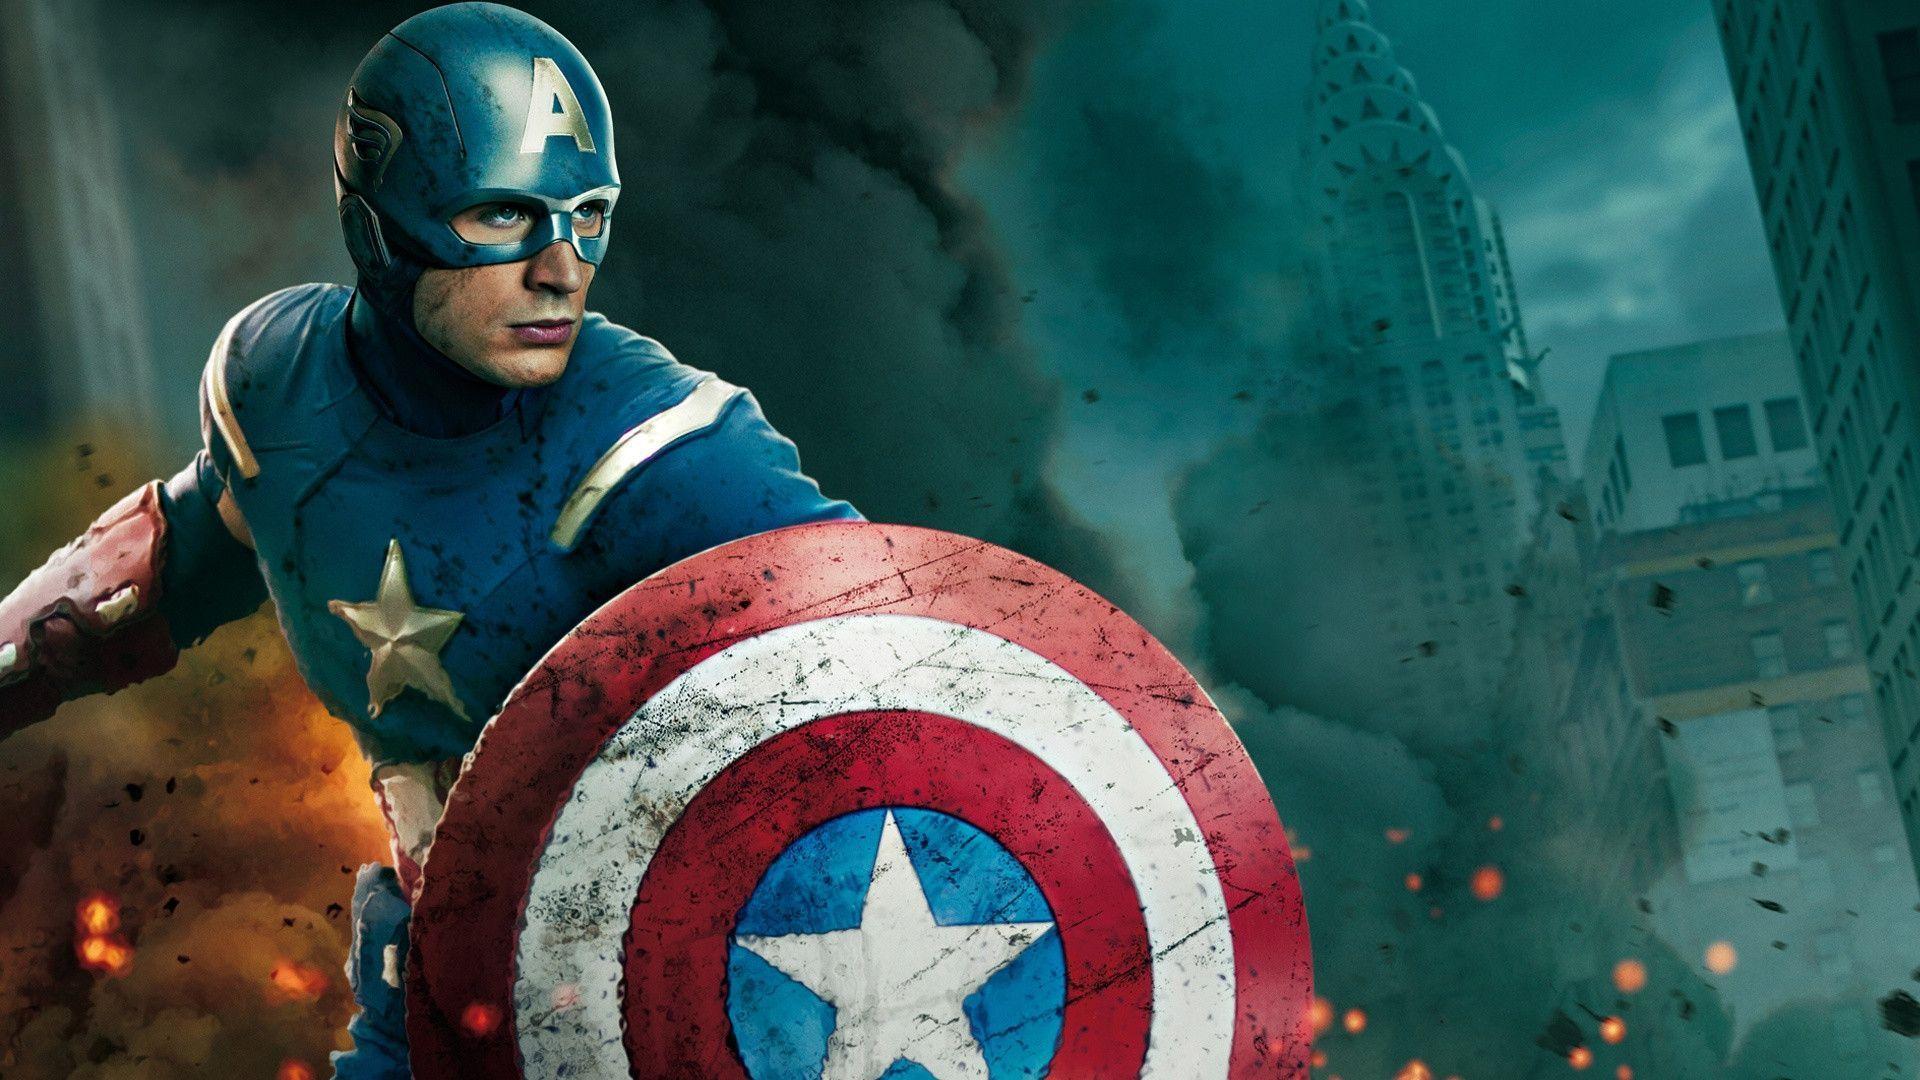 Avengers Pinterest: The Avengers Wallpaper HD Avengers HD Live Images HD